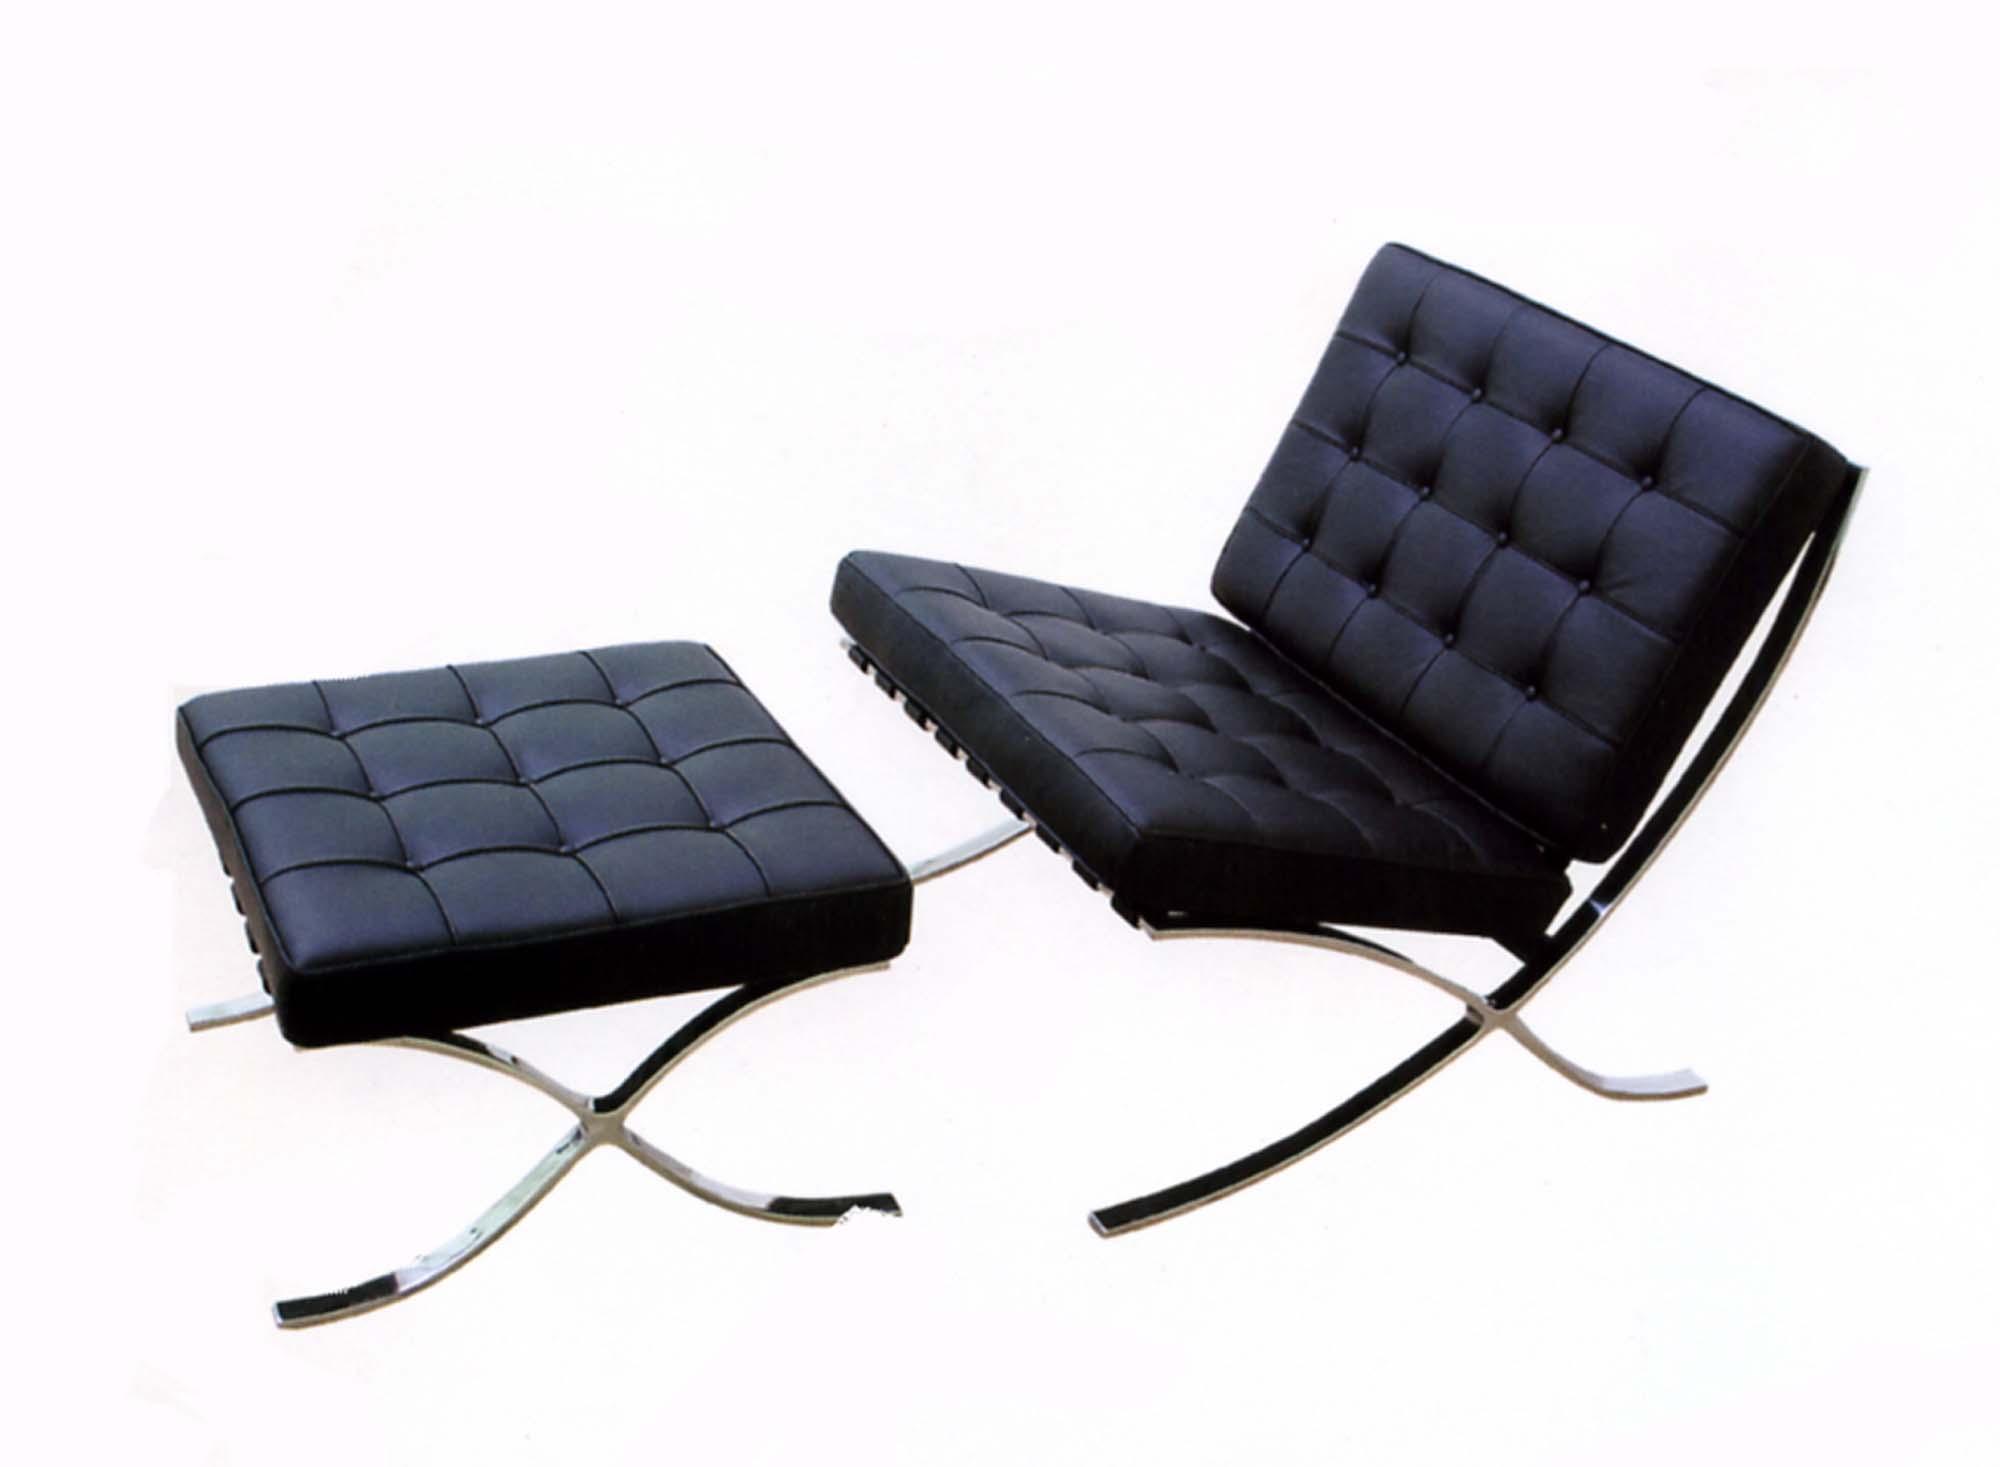 barcelona chair dimensions homesfeed. Black Bedroom Furniture Sets. Home Design Ideas